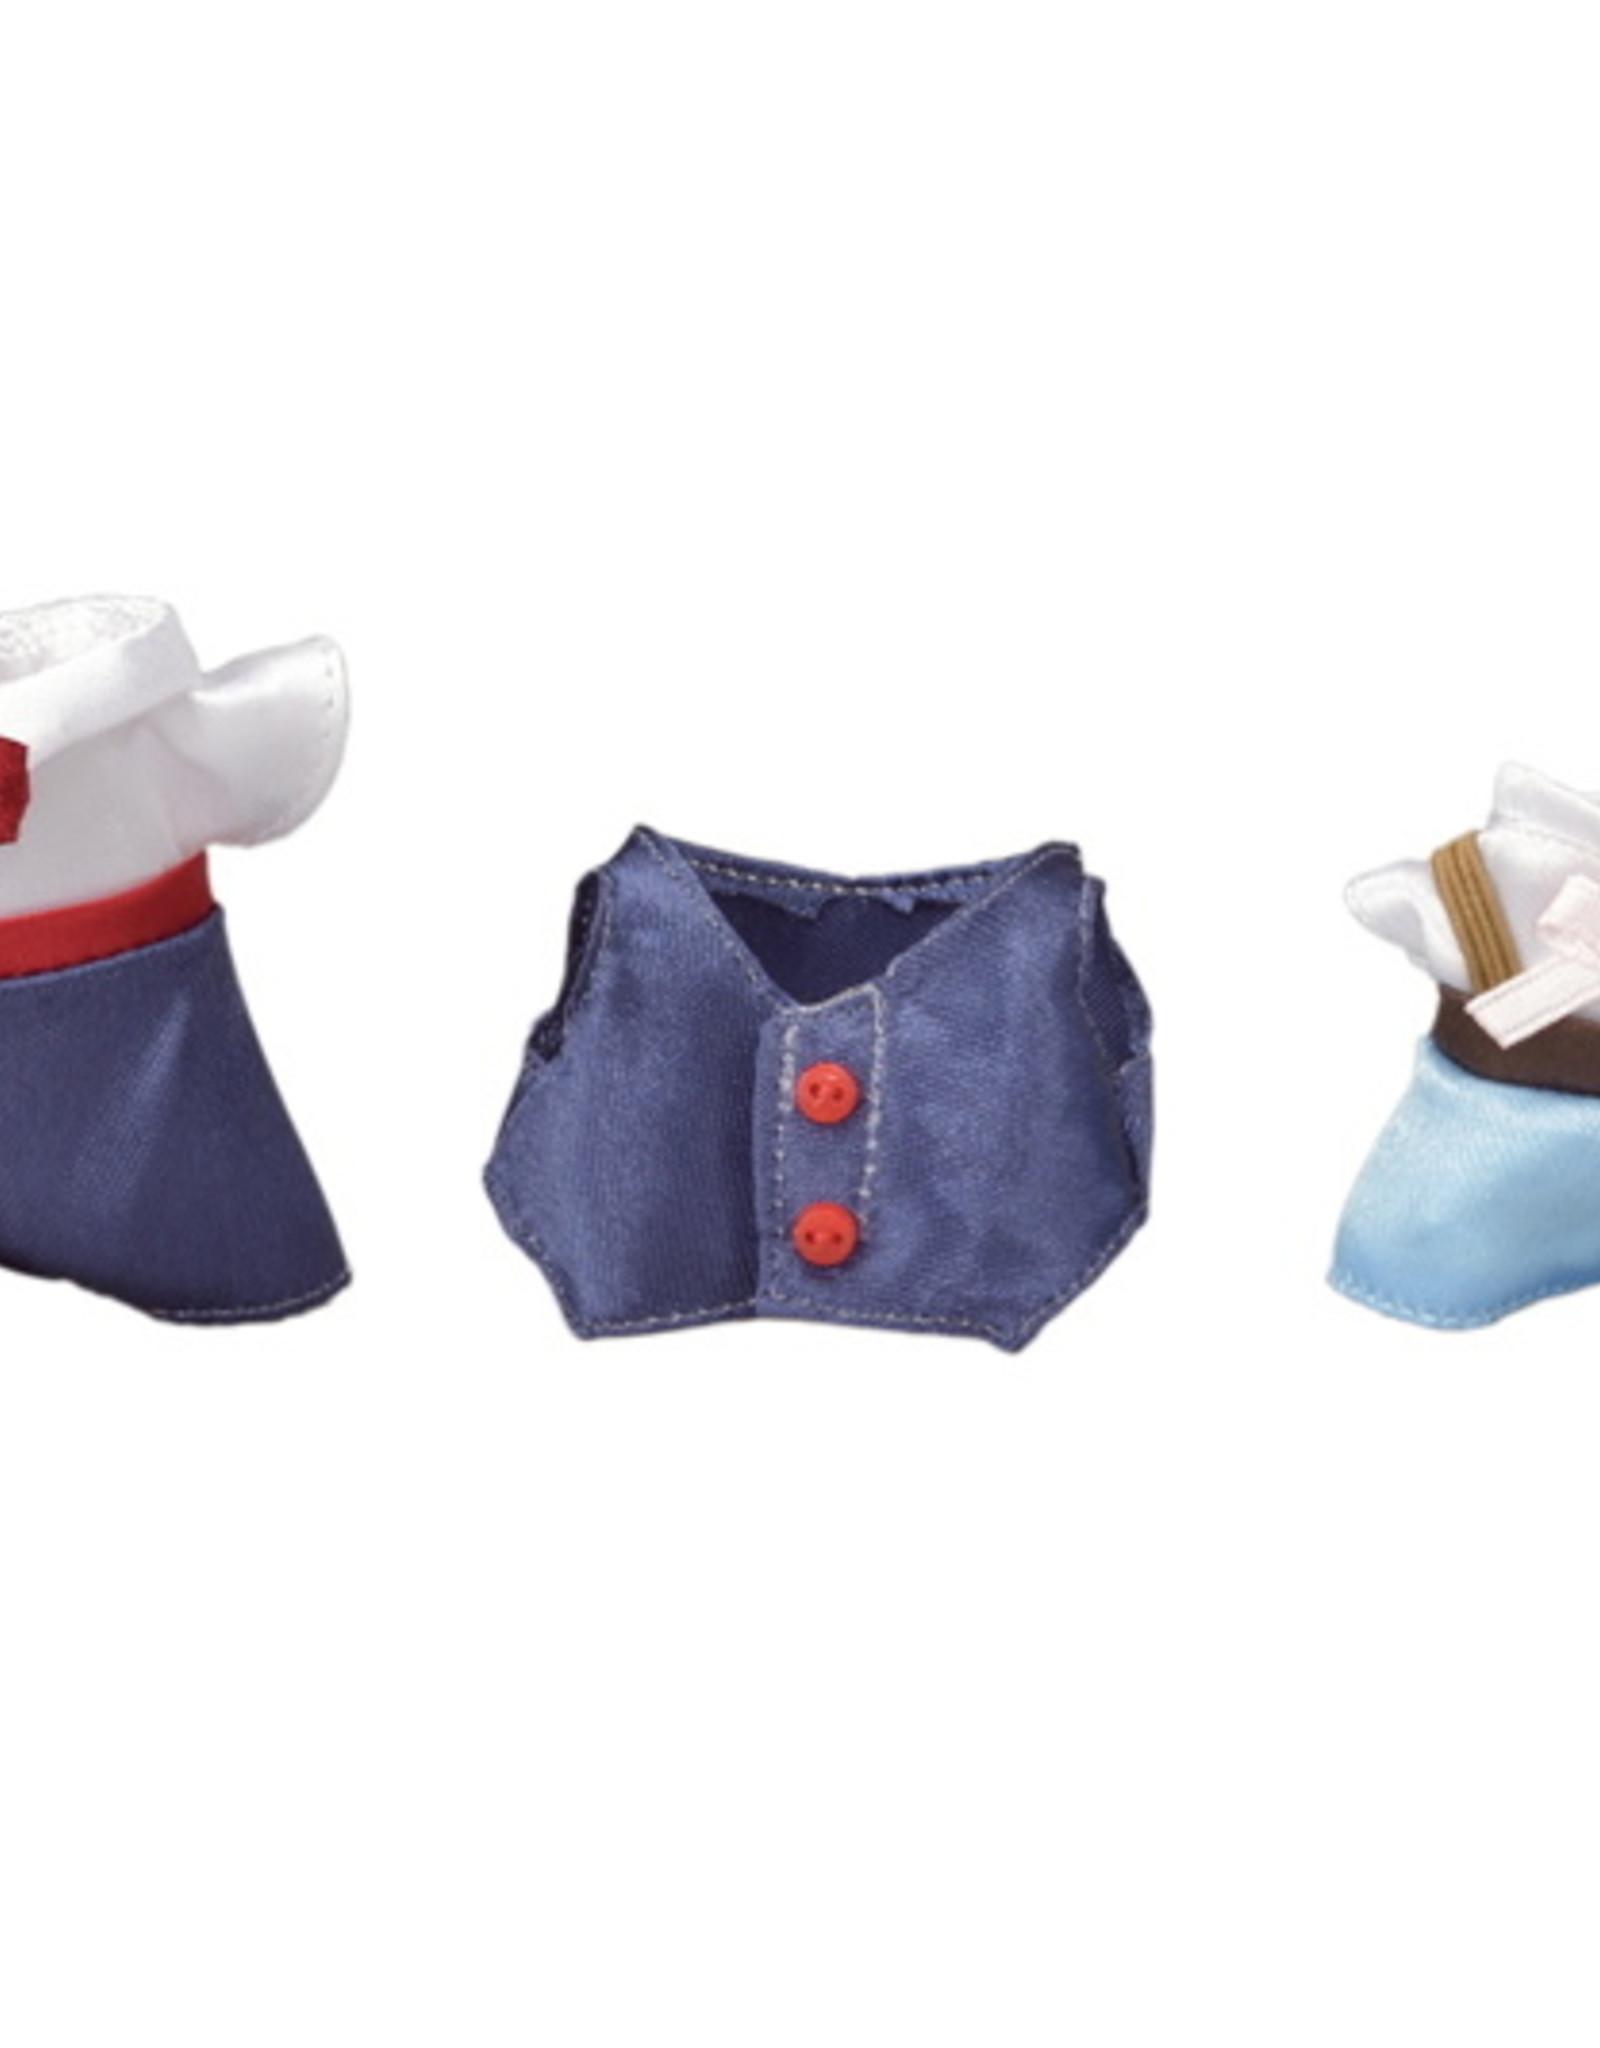 Calico Critters CC Dress Up Boy Set